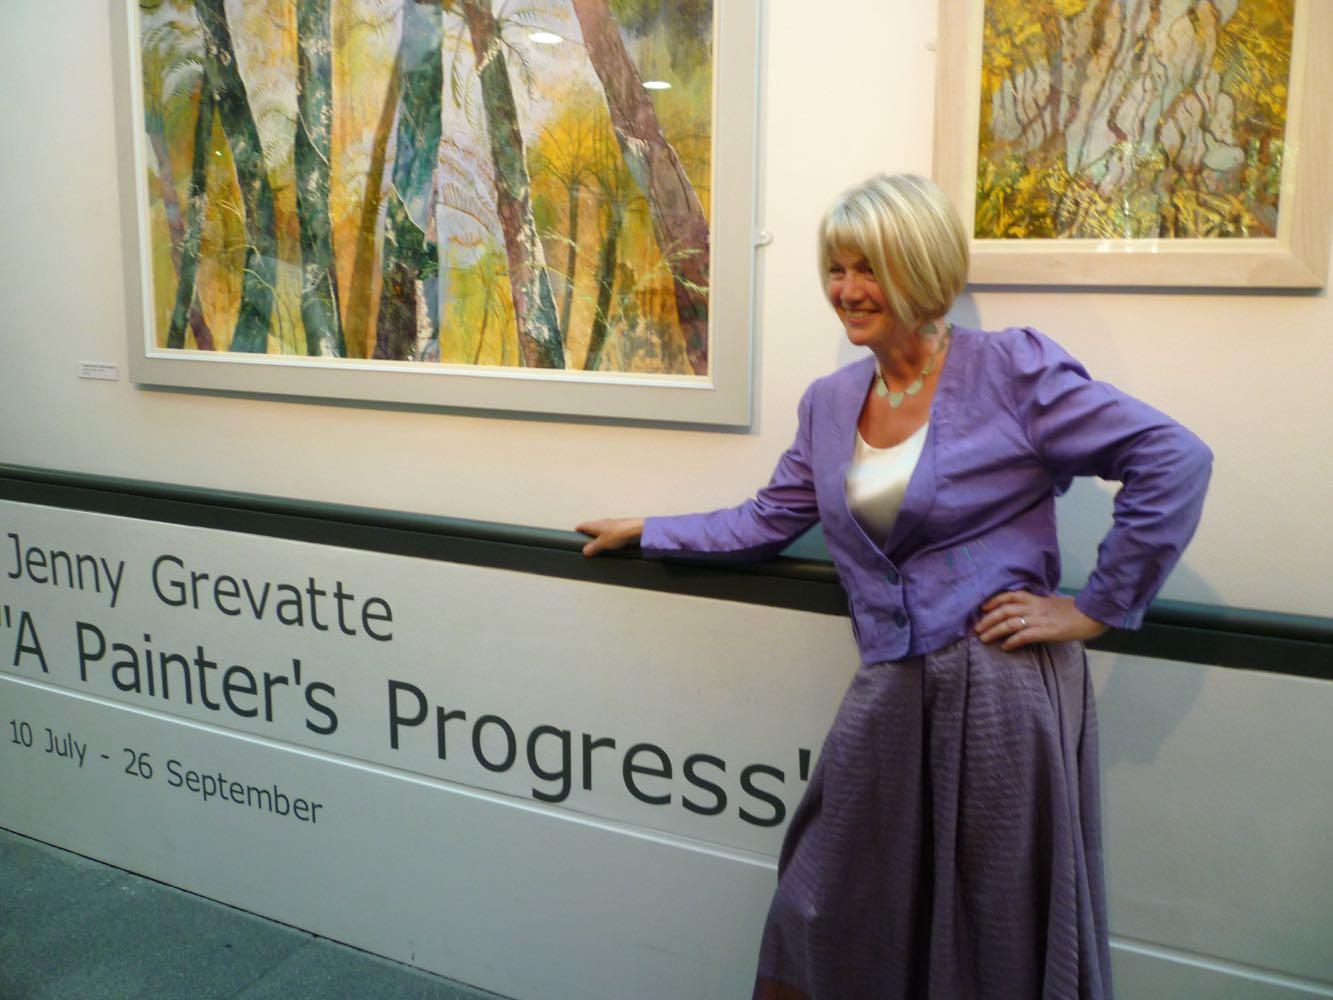 Painter's Progress Opening 2010